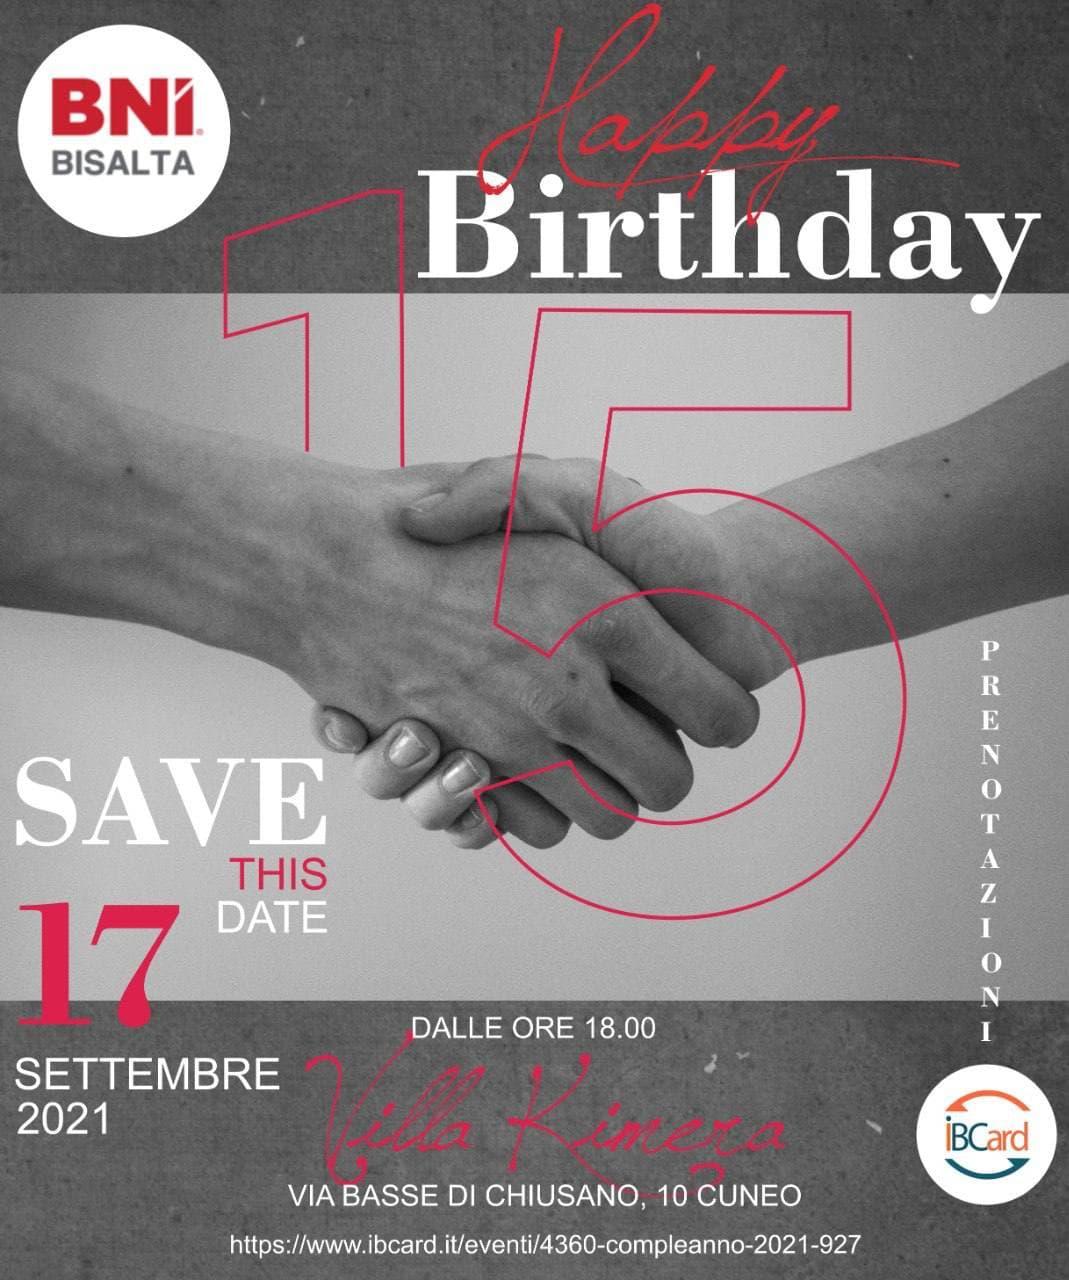 Happy birthday Capitolo BNI Bisalta